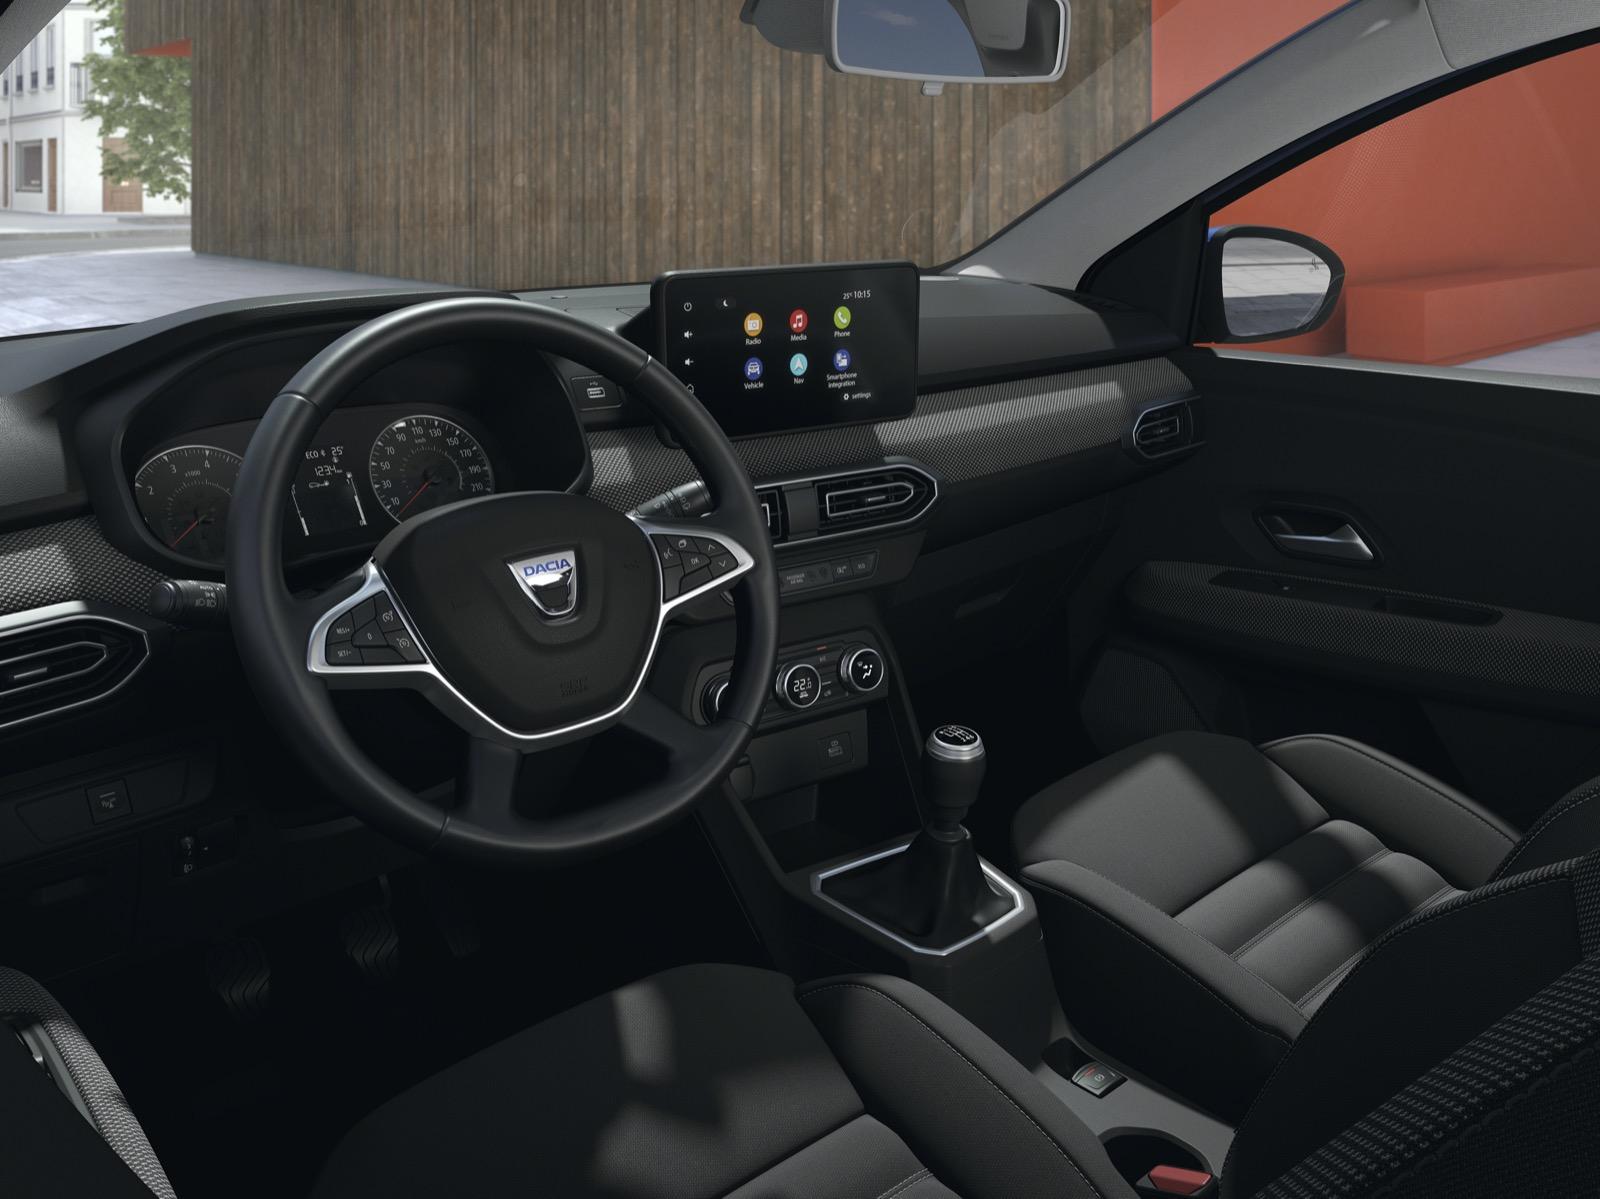 Dacia Sandero Iii (bji)